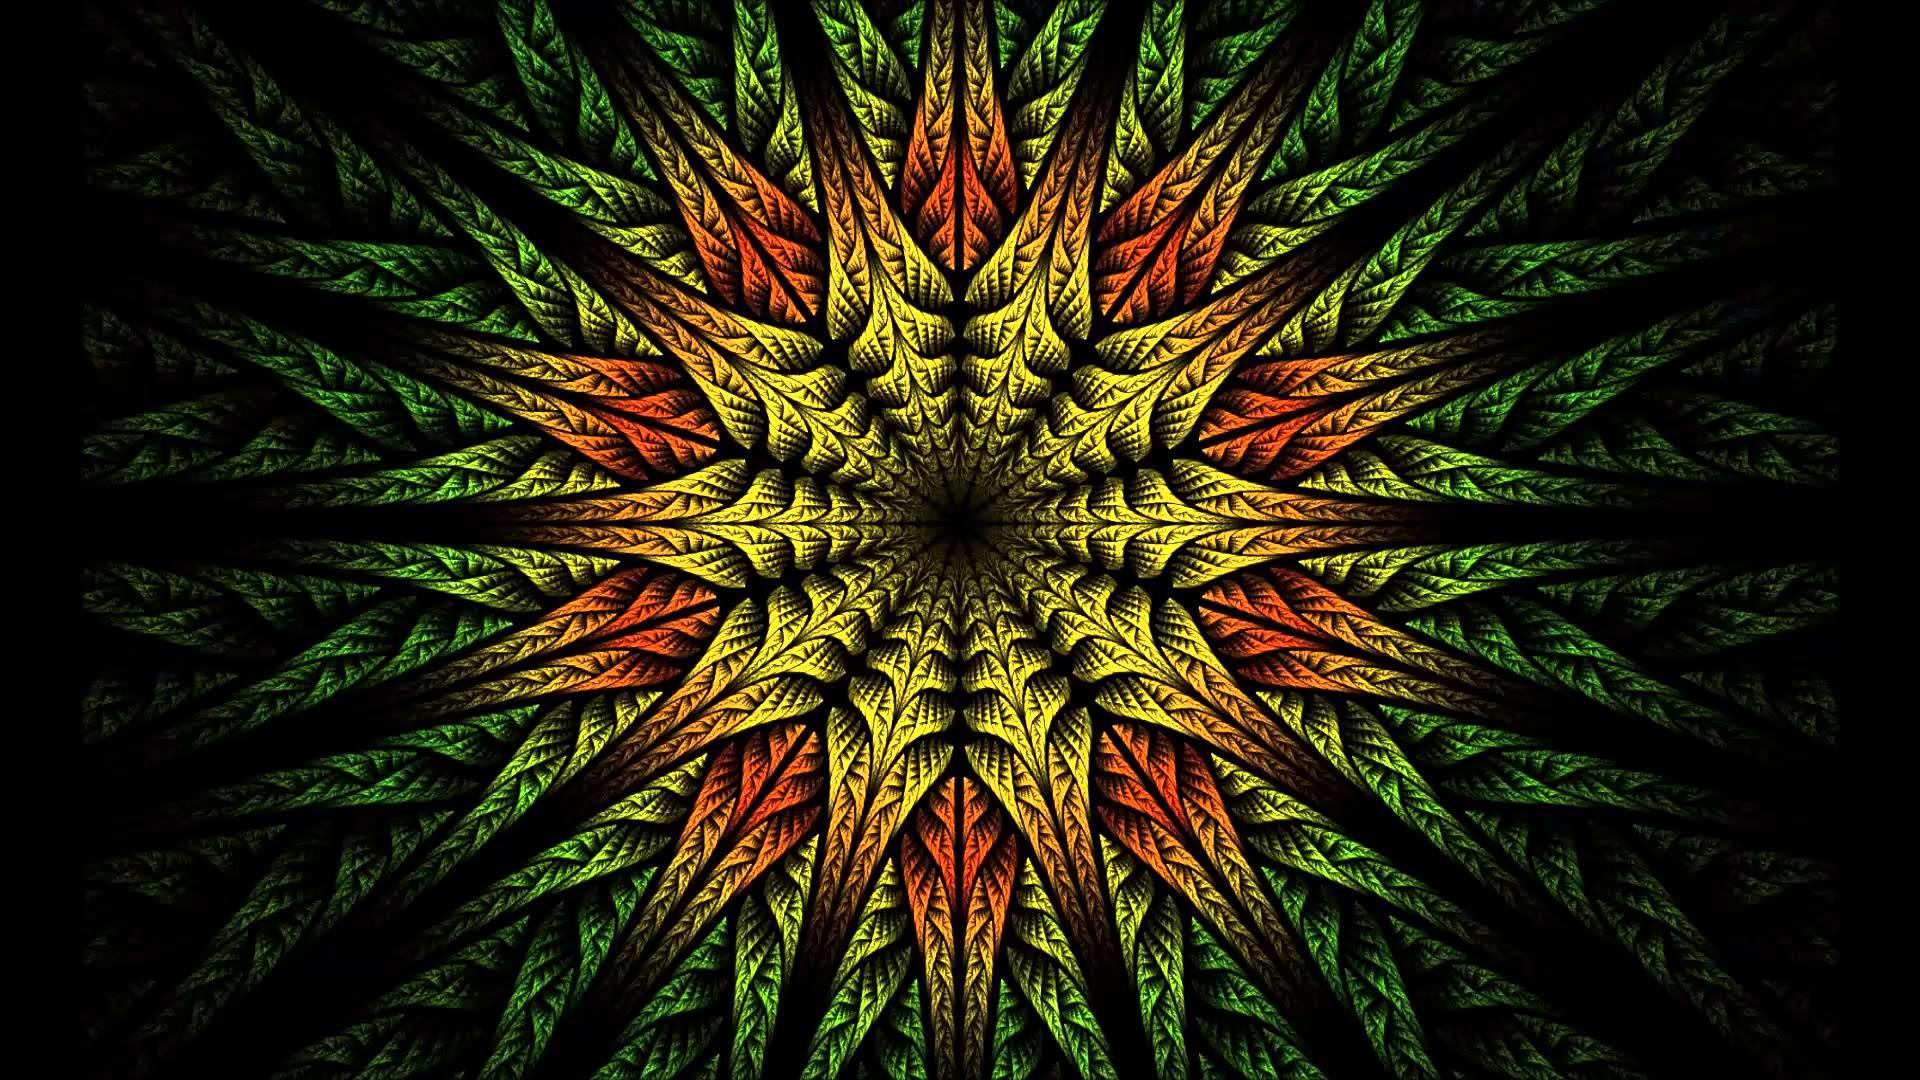 Psychedelic Computer Wallpapers, Desktop Backgrounds | 2560×1440 .